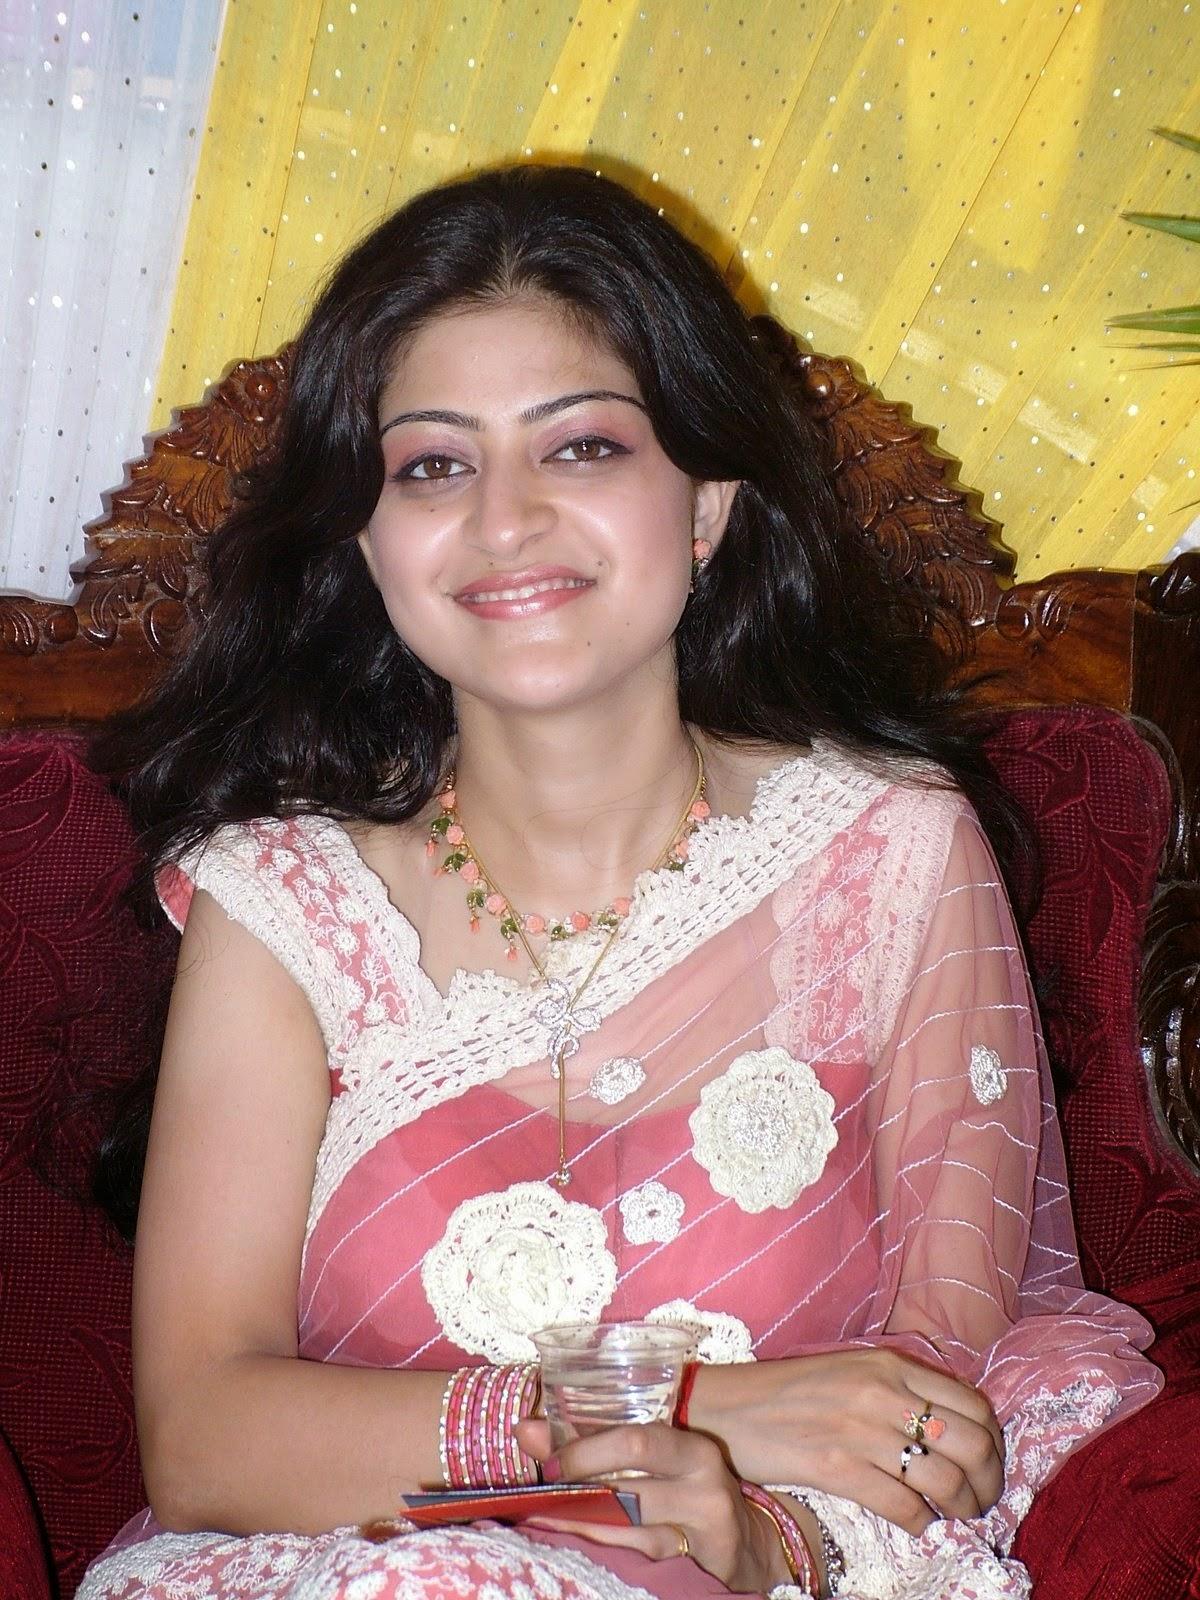 Pretty Desi Beautiful Housewife And Girls On Home Hd New -4708